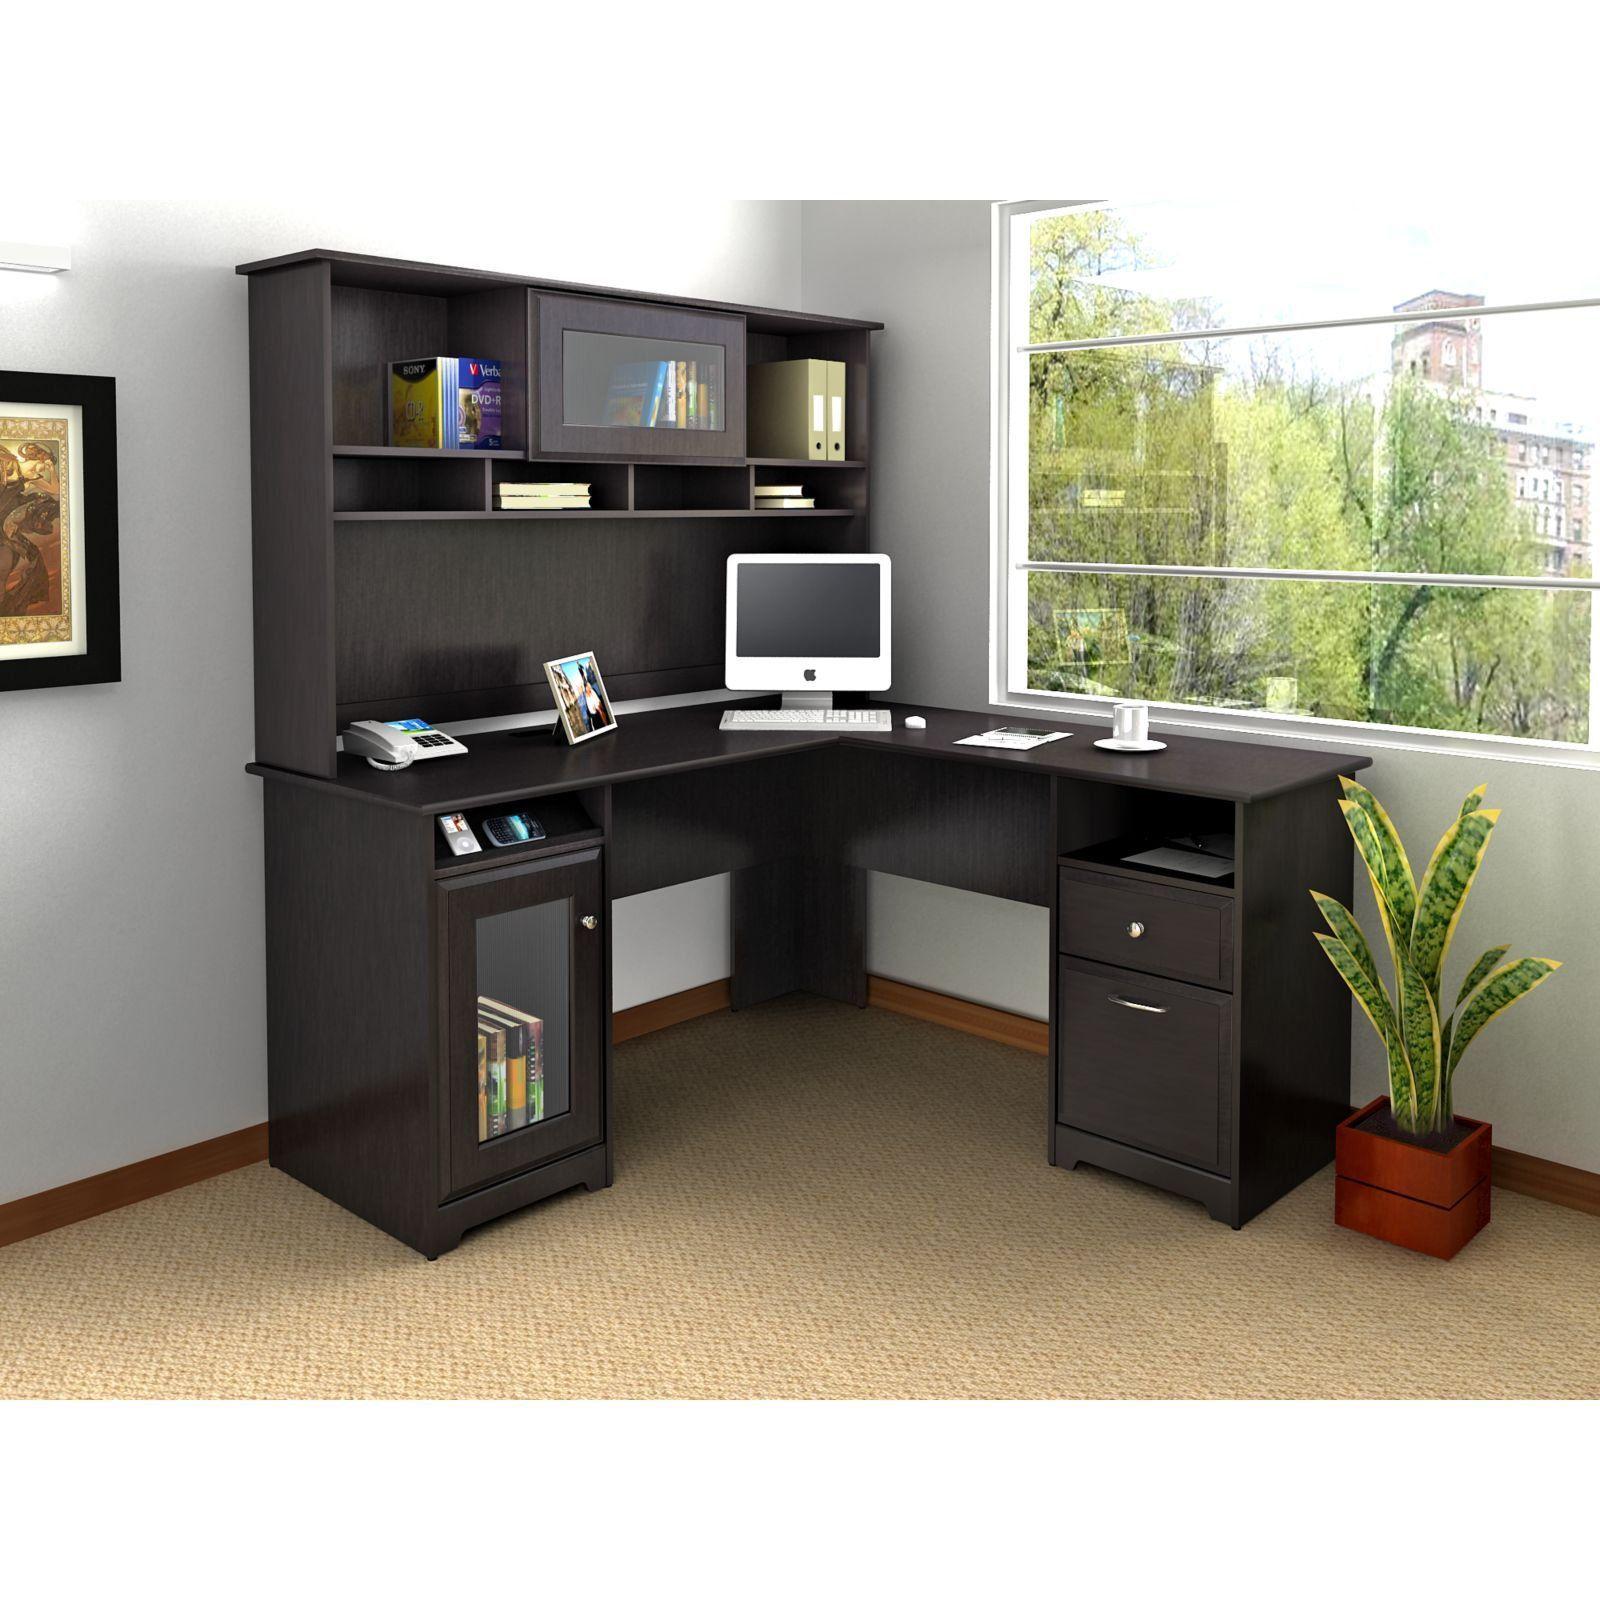 Top 10 Stunning Home Office Design Meja Kerja Mebel Minimalis